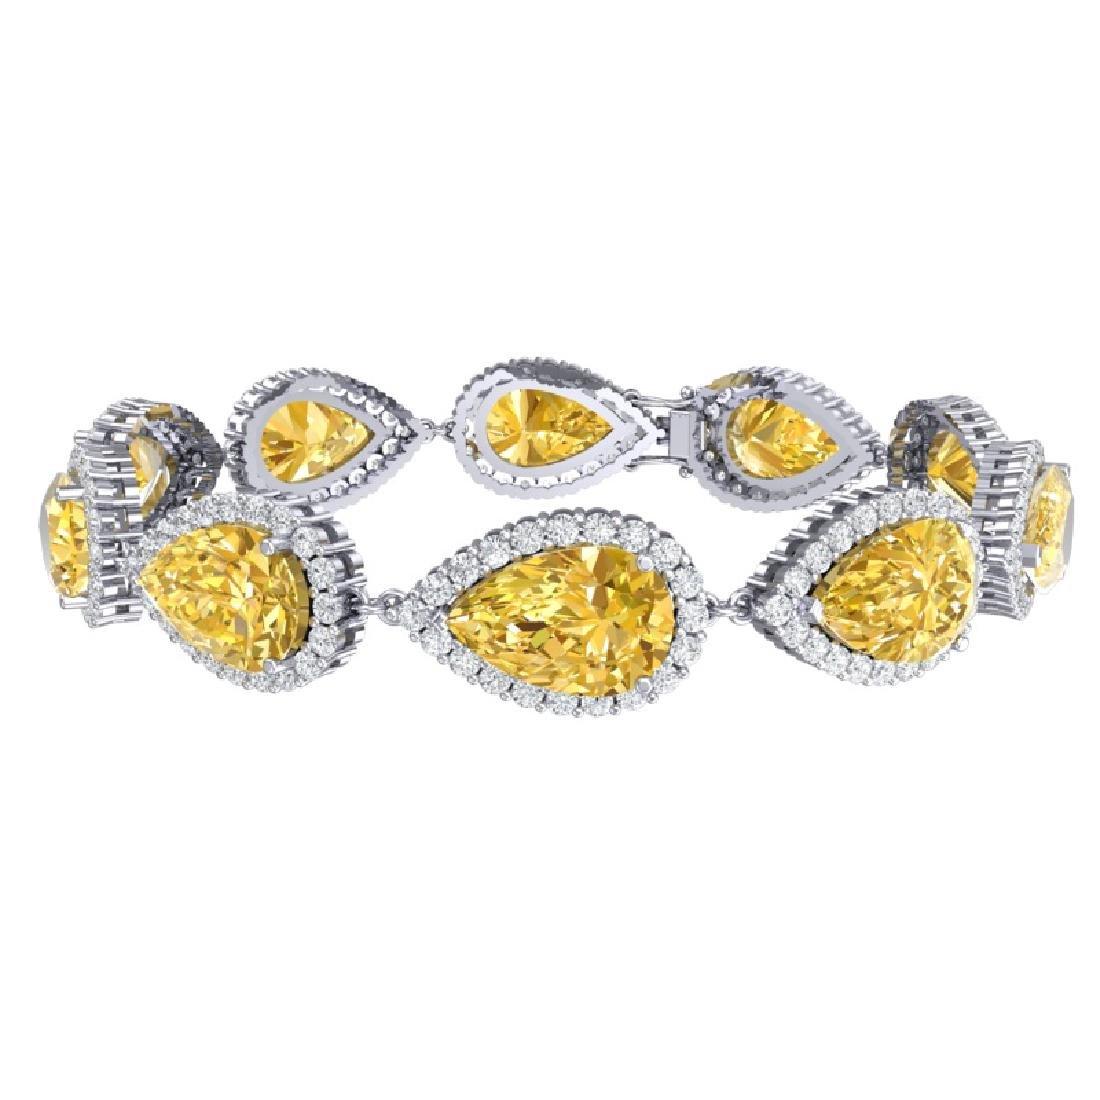 39.26 CTW Royalty Canary Citrine & VS Diamond Bracelet - 2